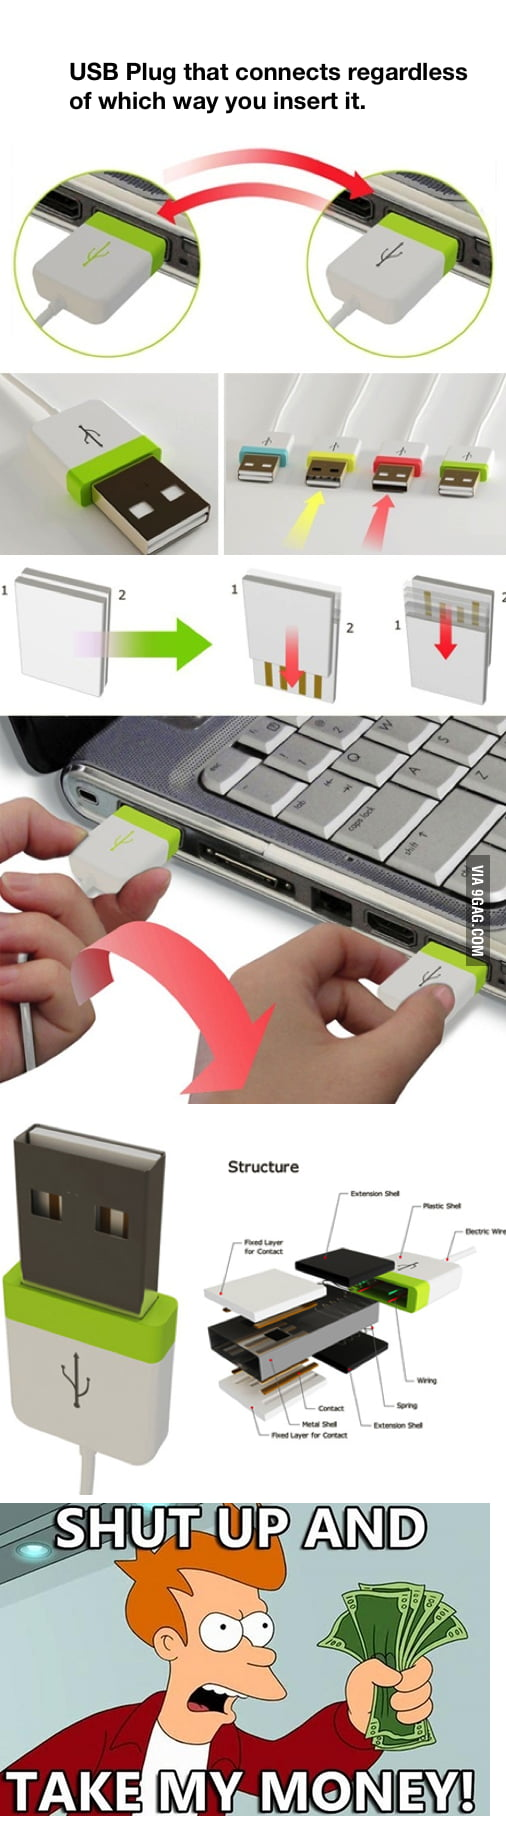 USB Problems.